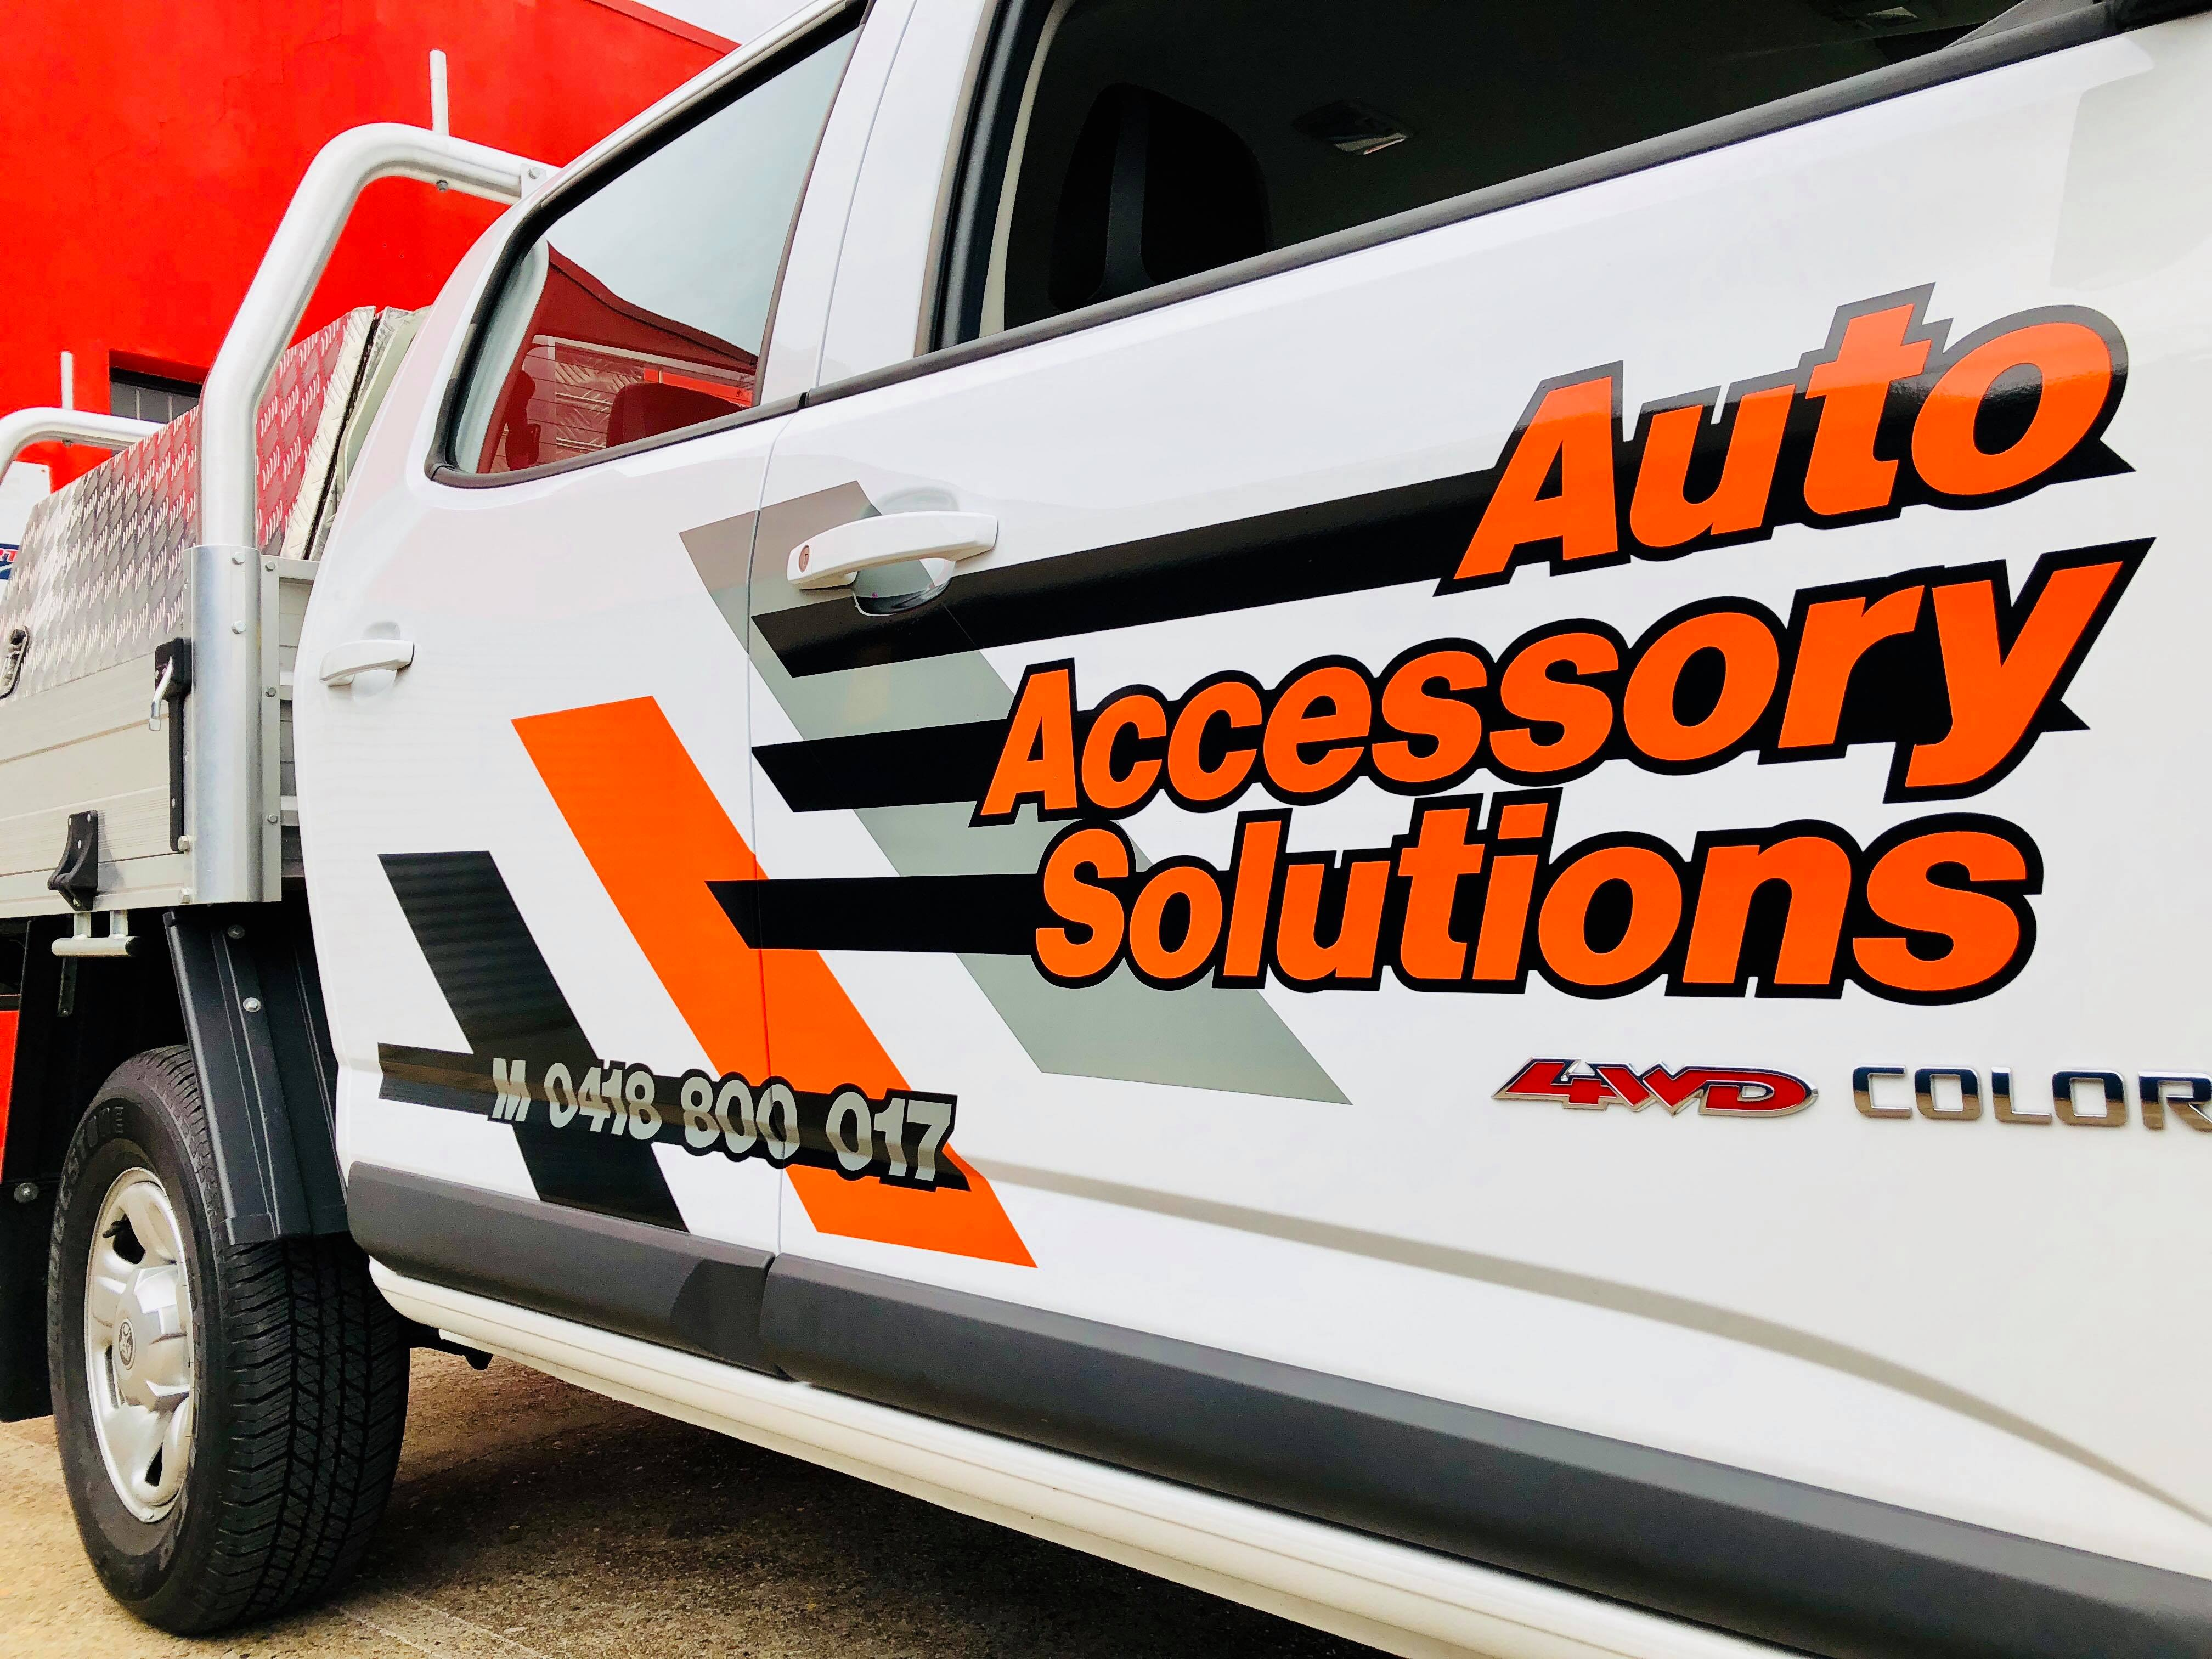 Auto Accessory Solutions